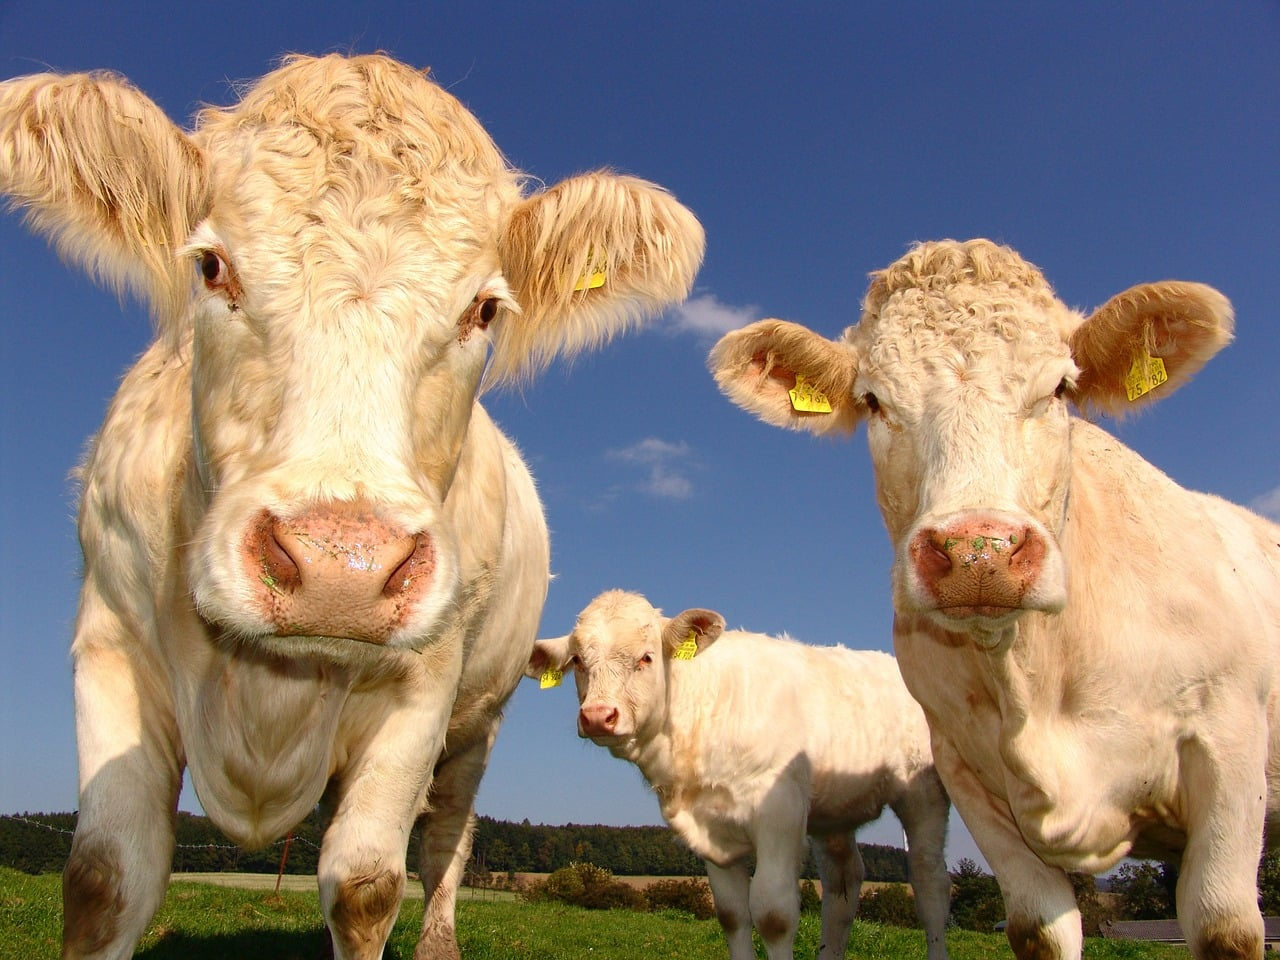 Two headed mutant calf stuns farmers in Brazil [Video]